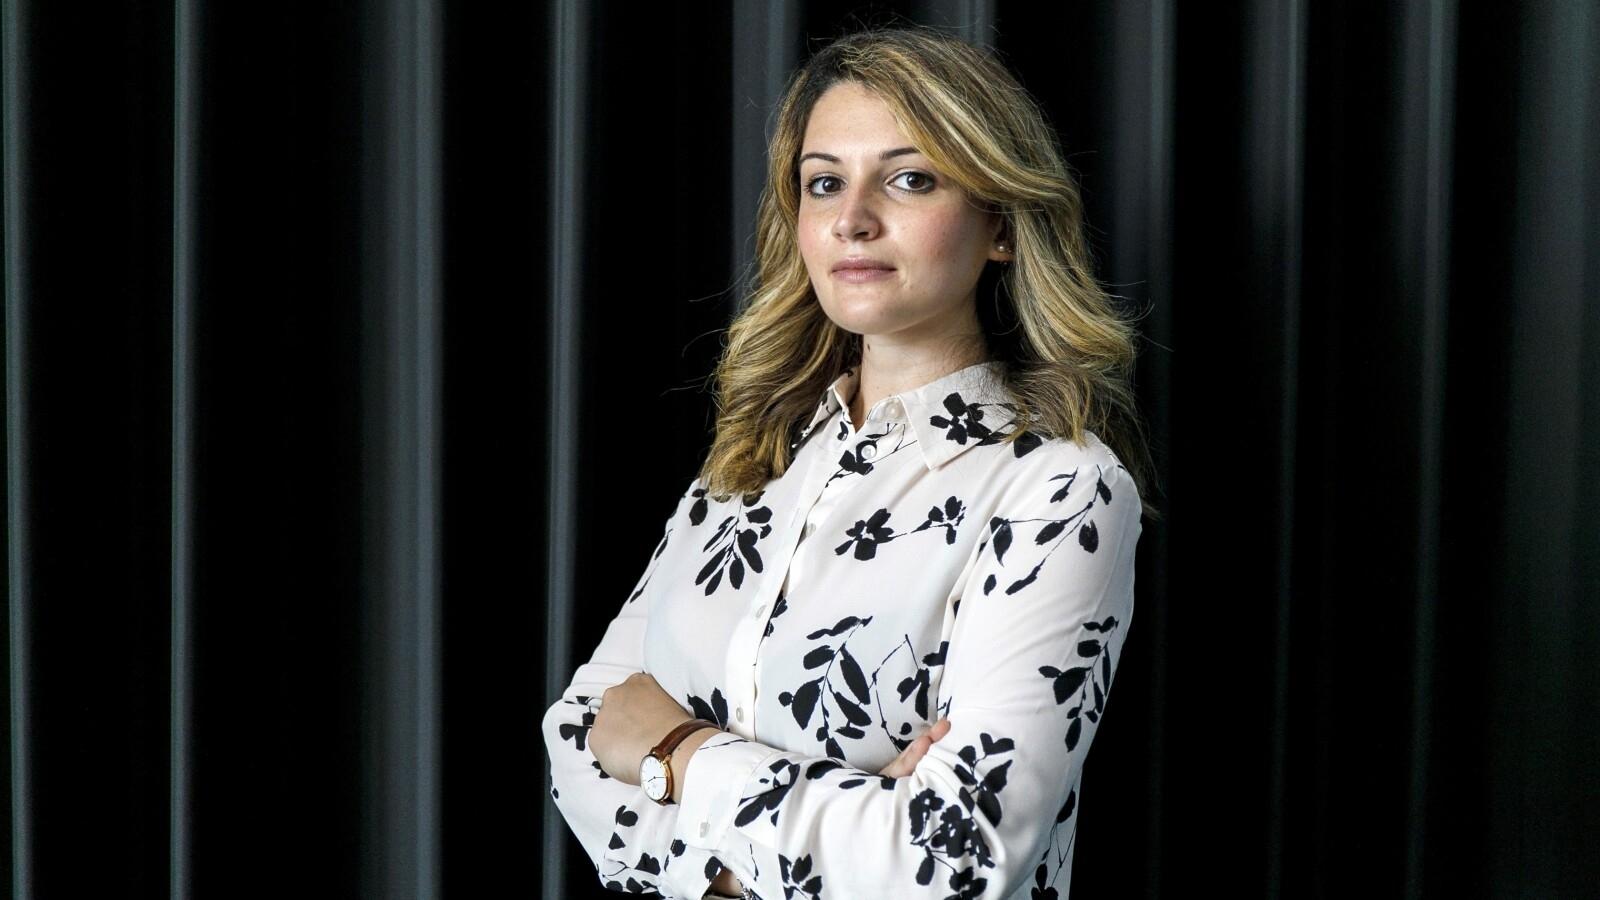 Cristina Sgobio